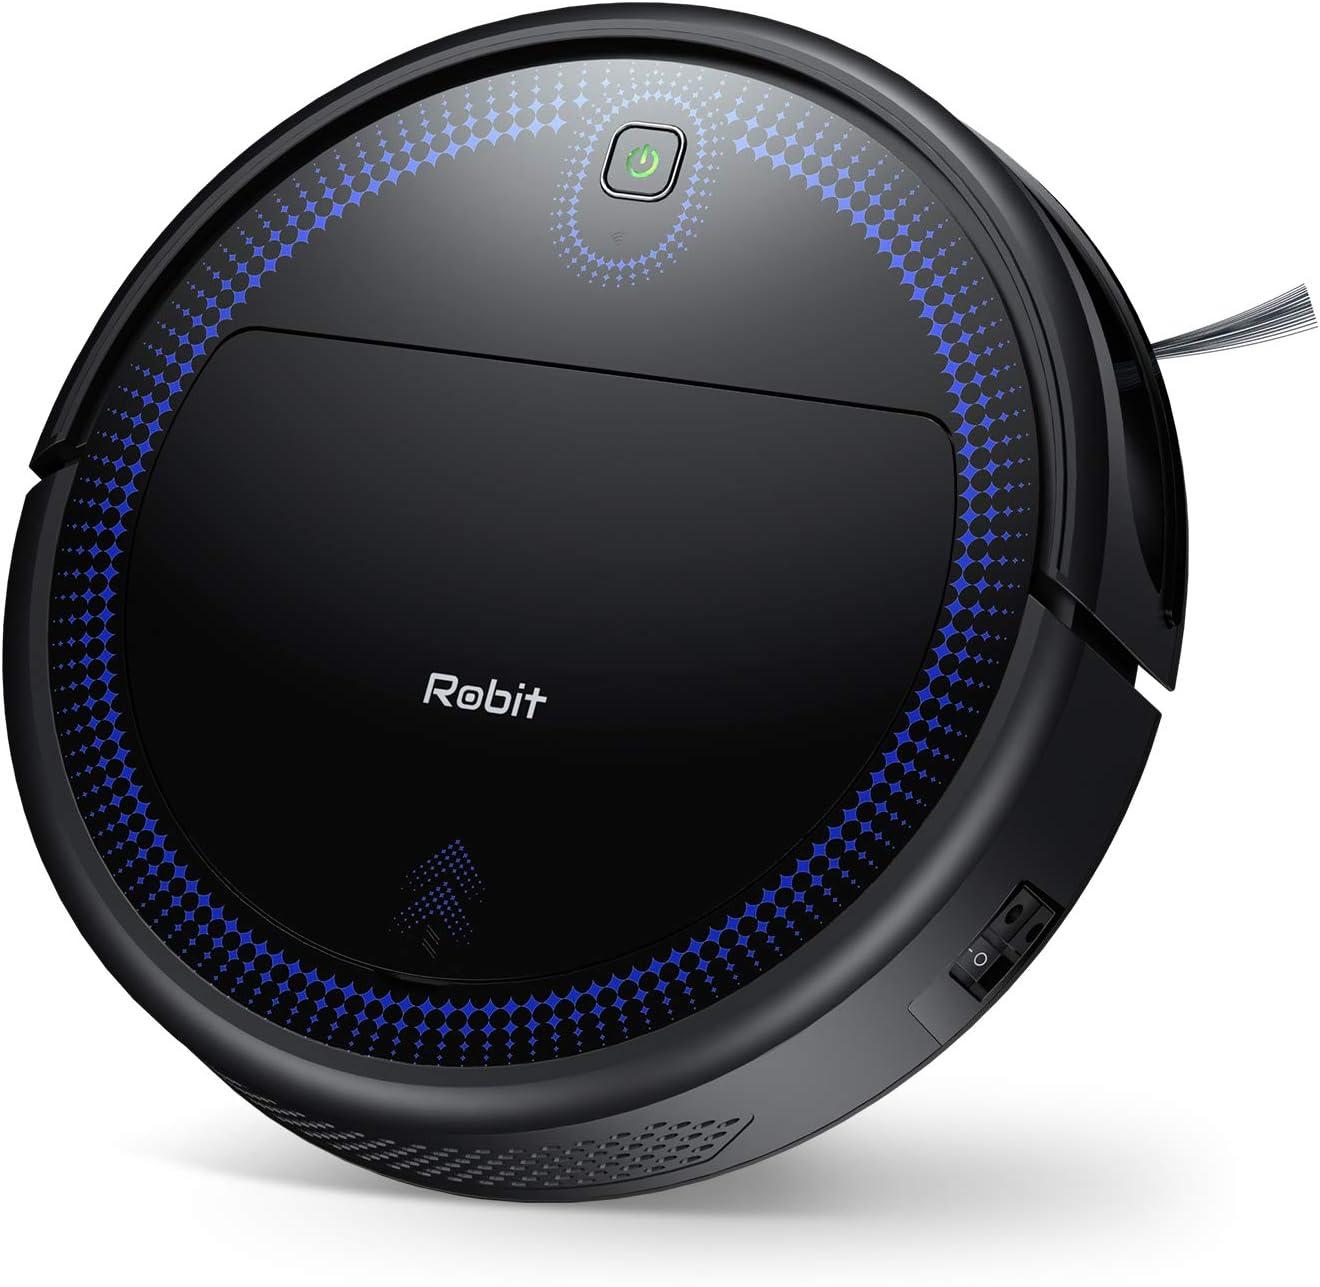 Image of Robit V7S PRO Robot Vacuum Cleaner